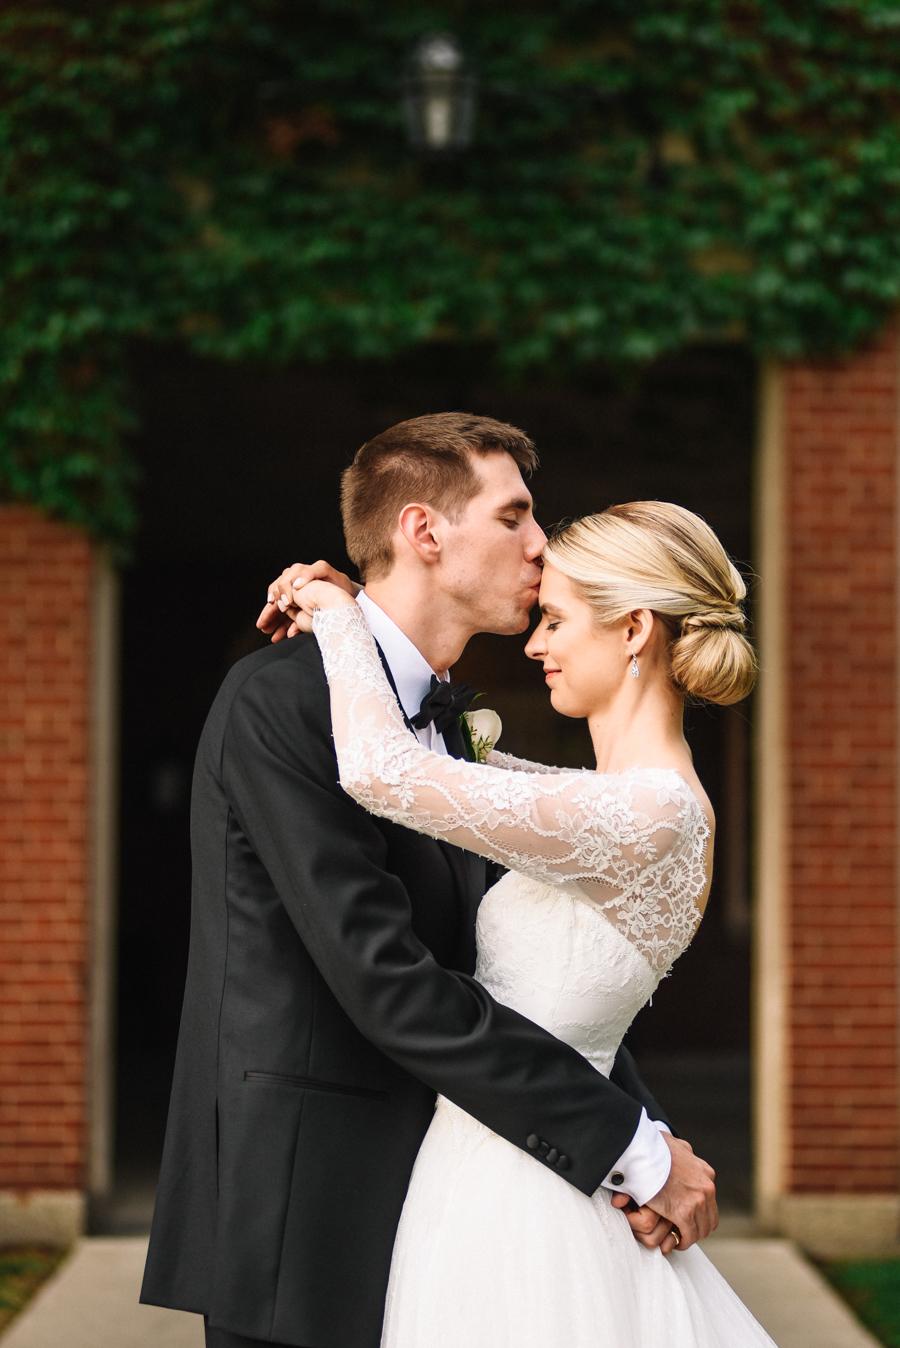 Henry_Ford__Lovett_Hall_Wedding_Detroit-27.jpg